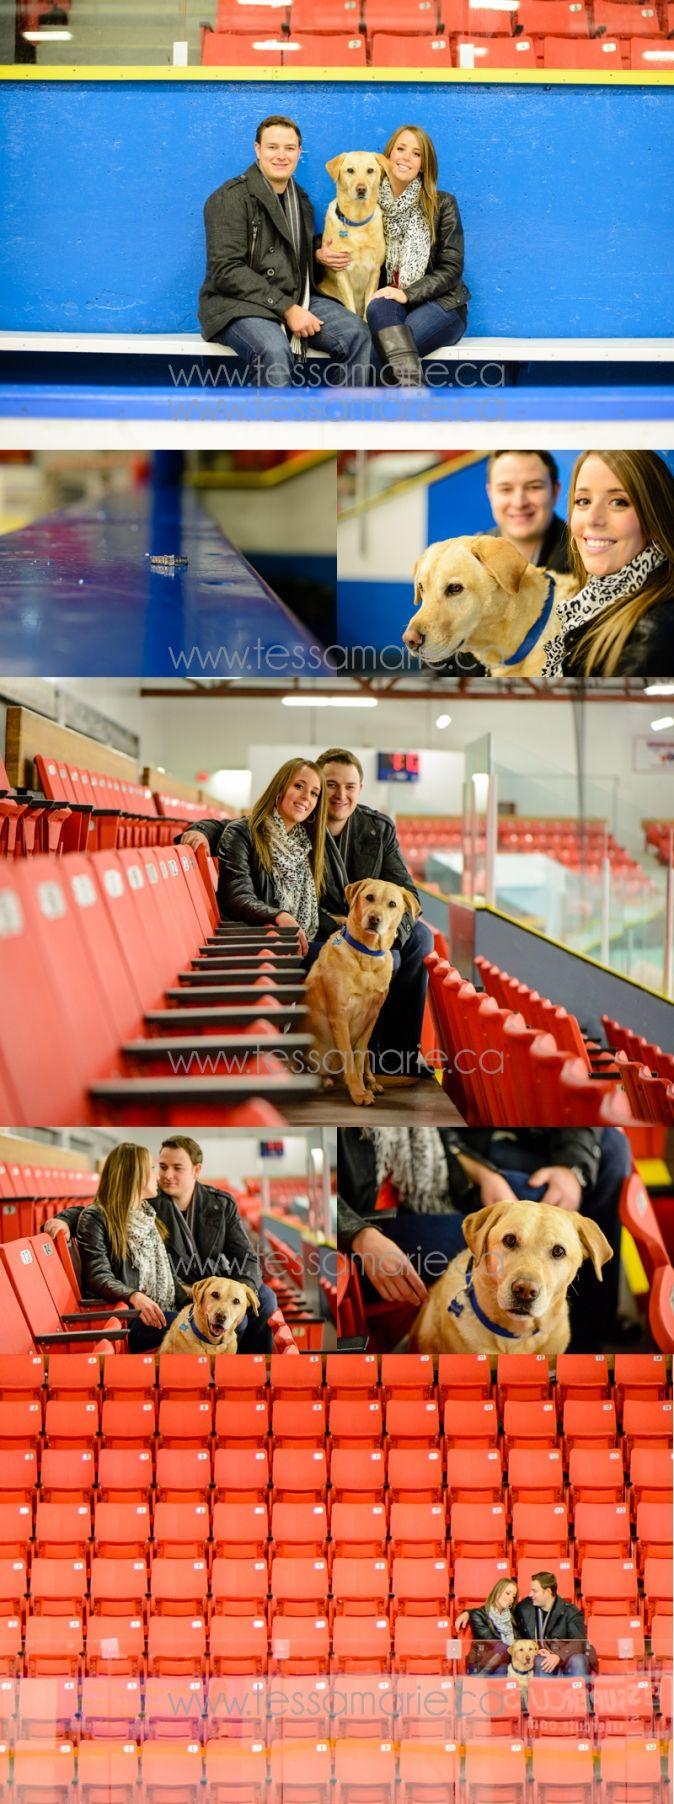 Hockey Rink Engagement Photos Calgary Wedding Photographer www.tessamarie.ca